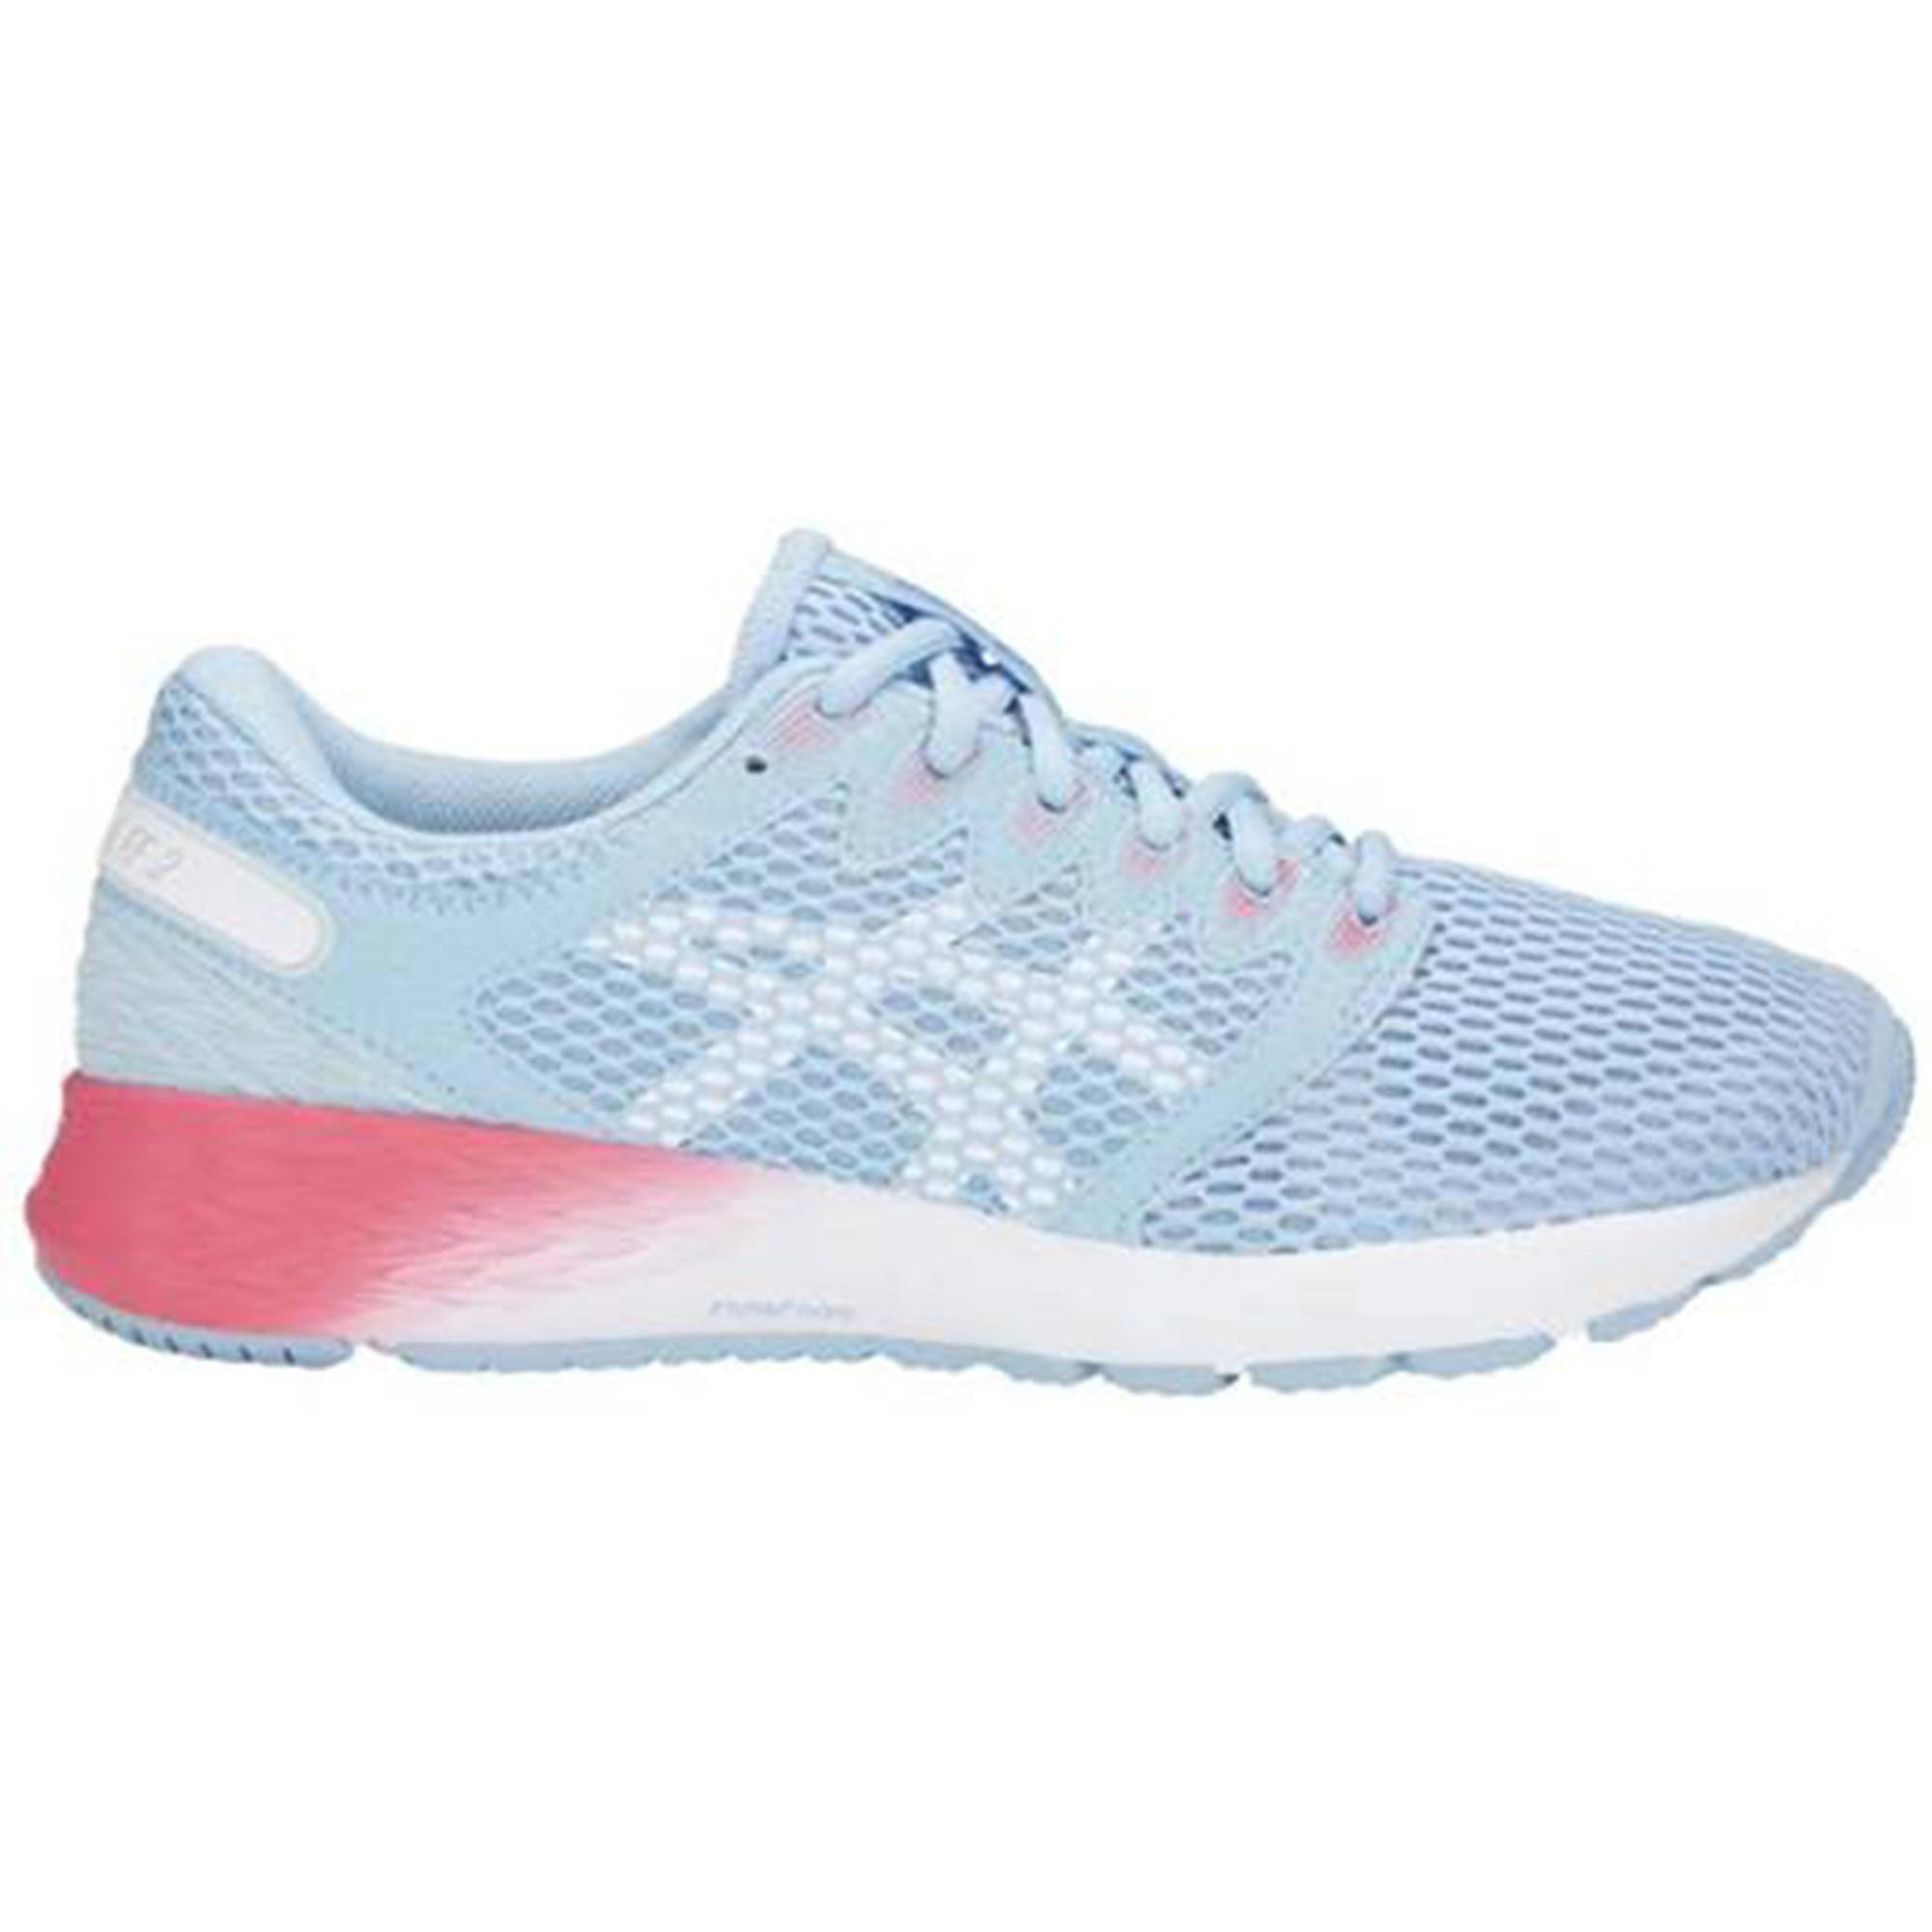 2edf259e5 Comprar Zapatillas de Running Online | Decathlon